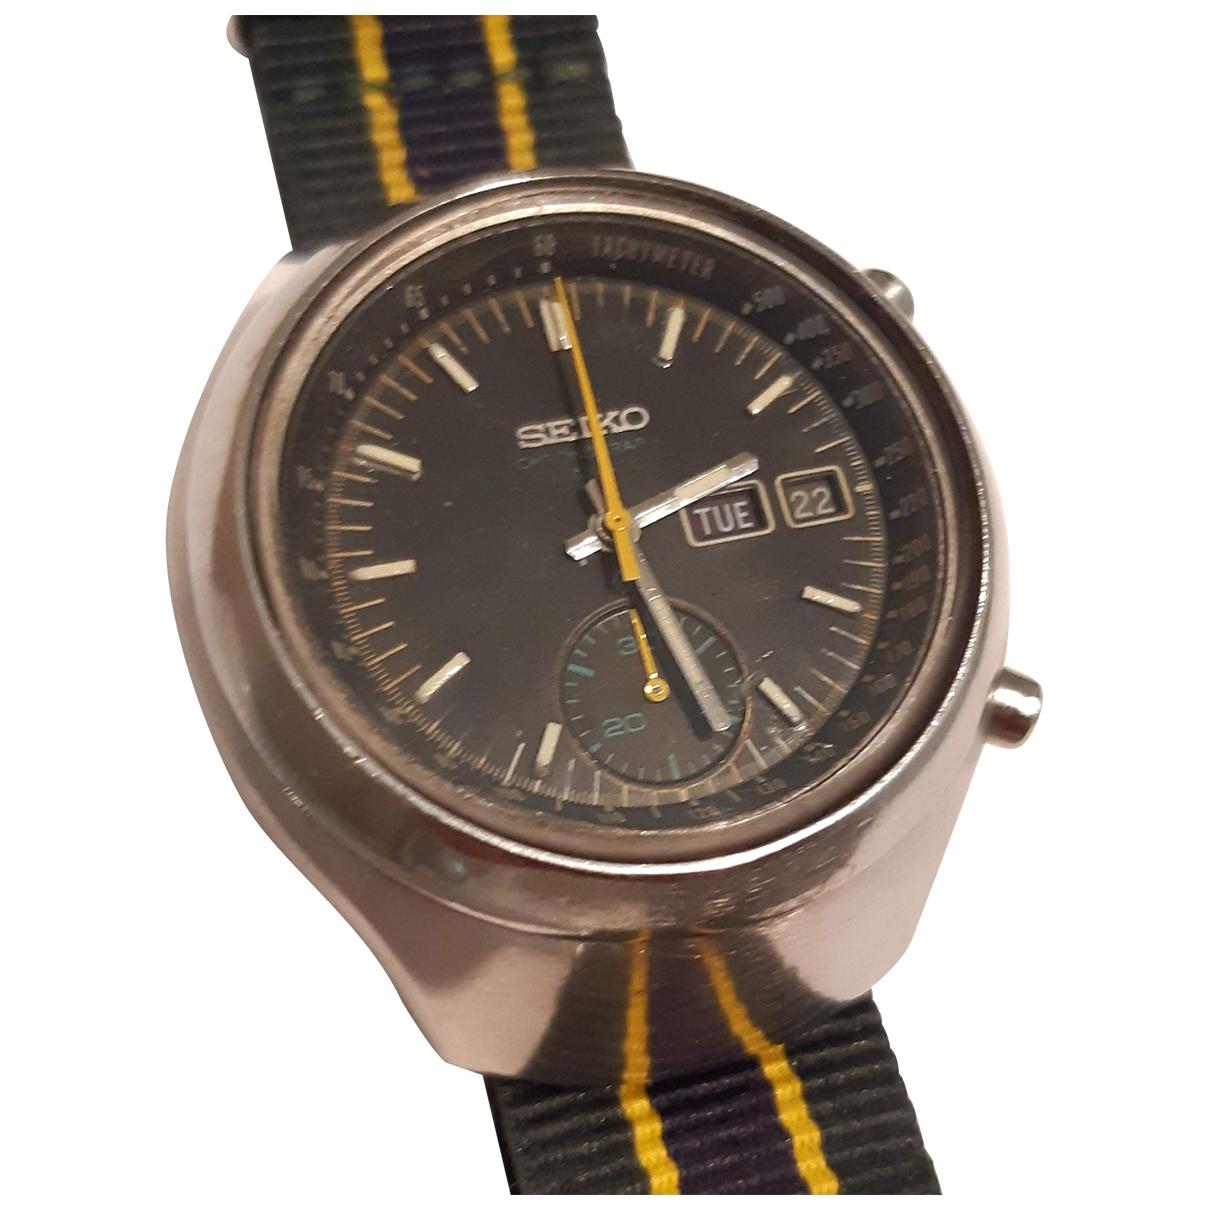 Seiko \N Silver Steel watch for Men \N